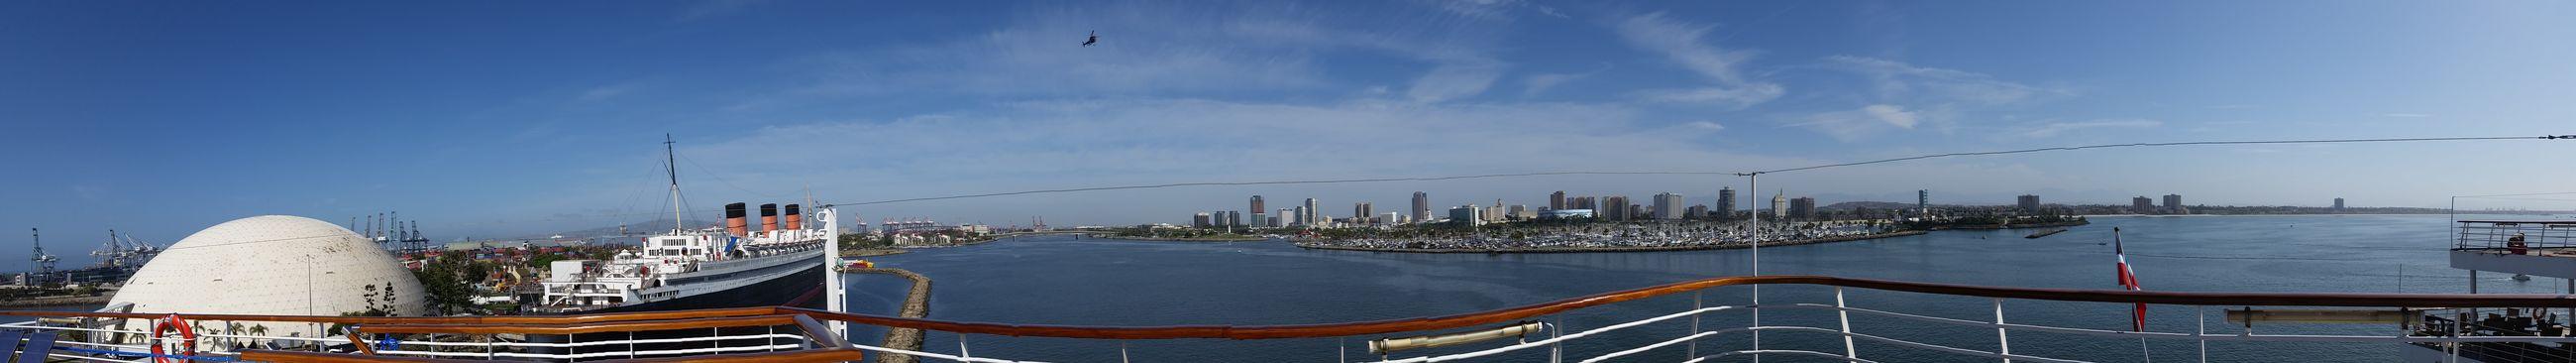 Panorama Panoporn LBC Downtown Long Beach  Cruisetime Shoreline